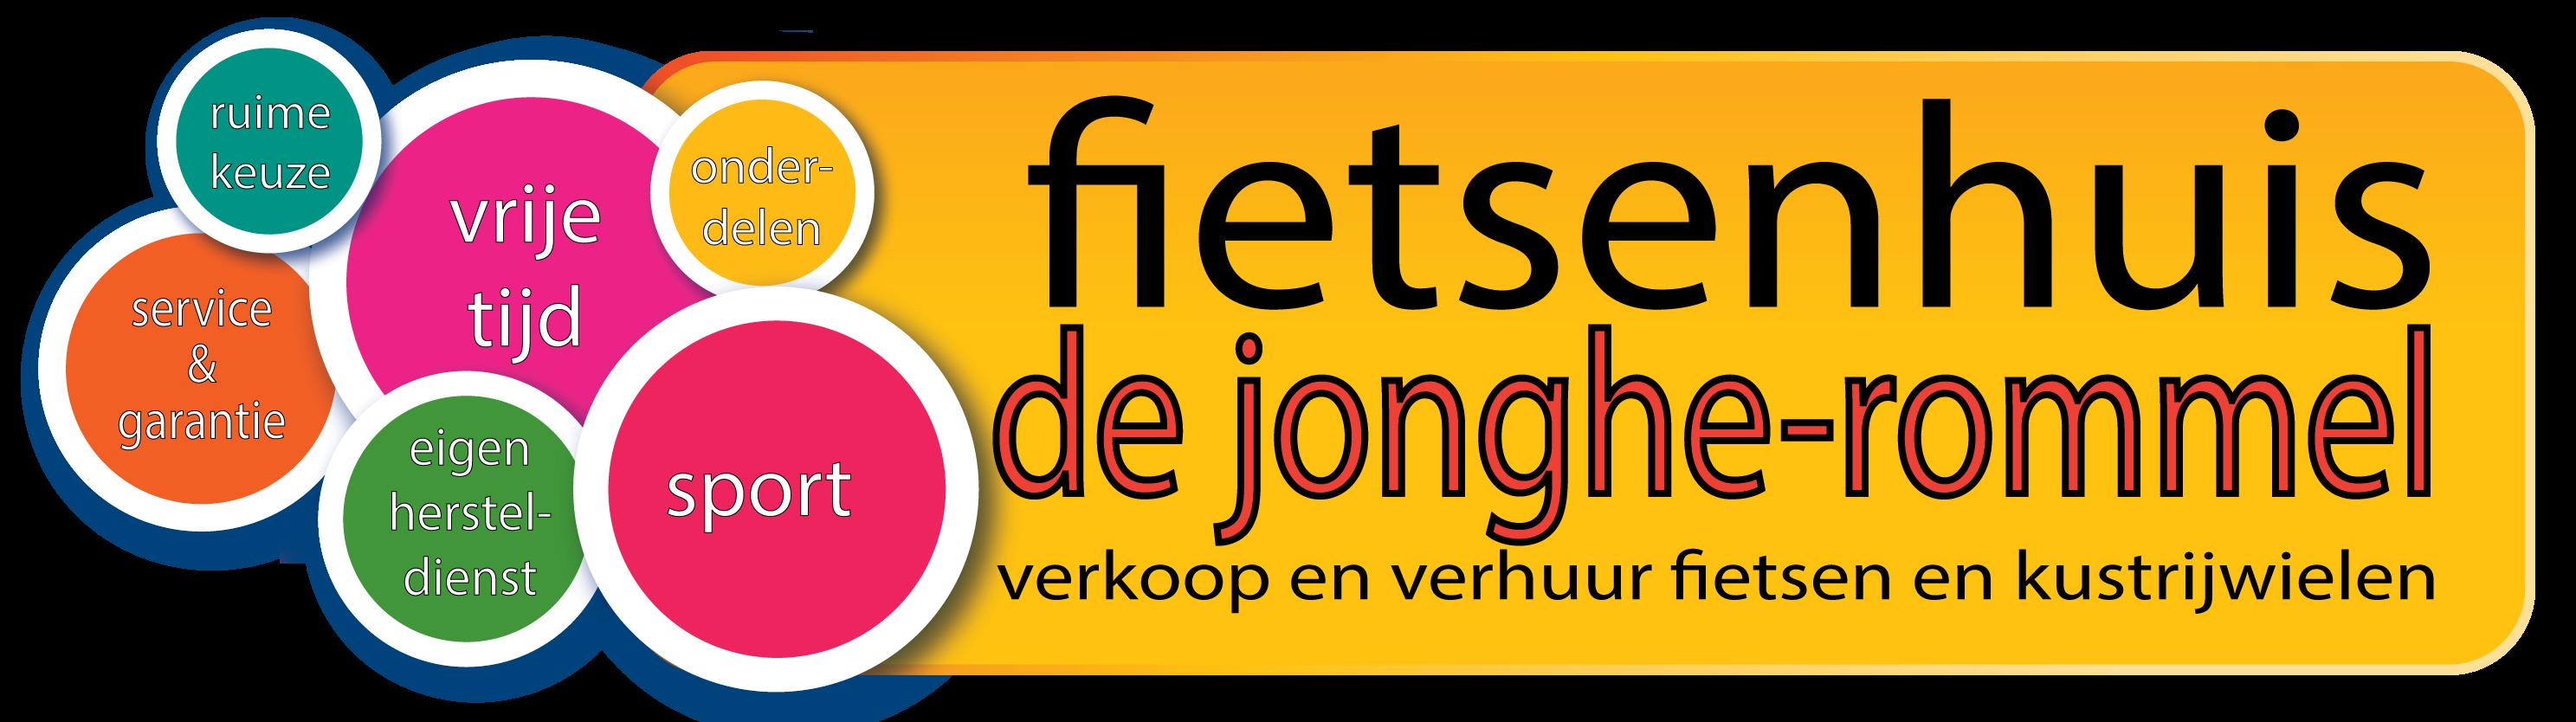 fietsenhuis De-Jonghe Rommel